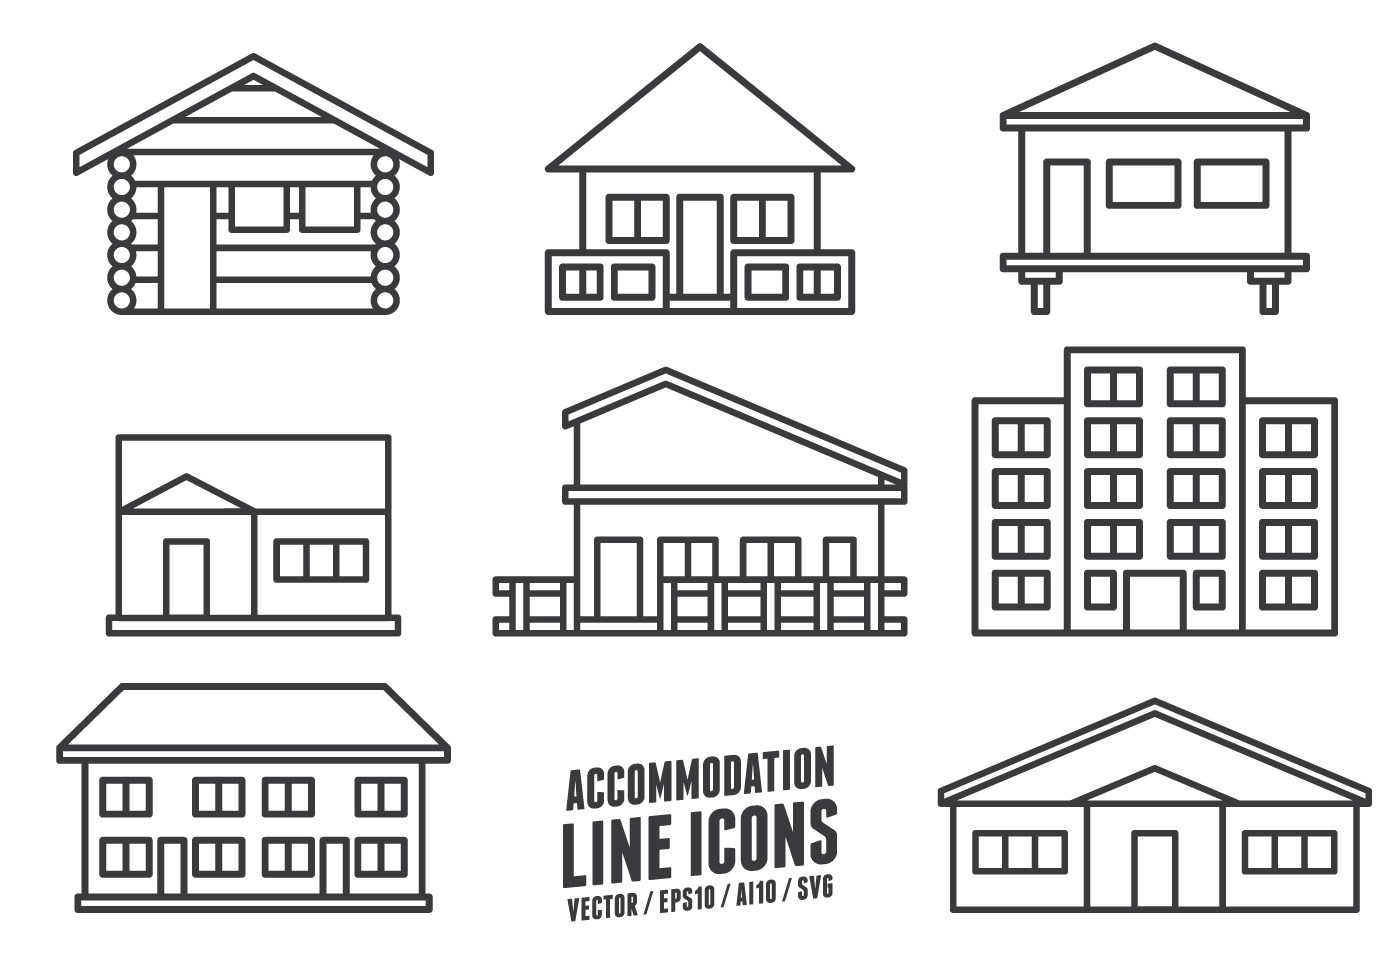 Accommodation Line Icons